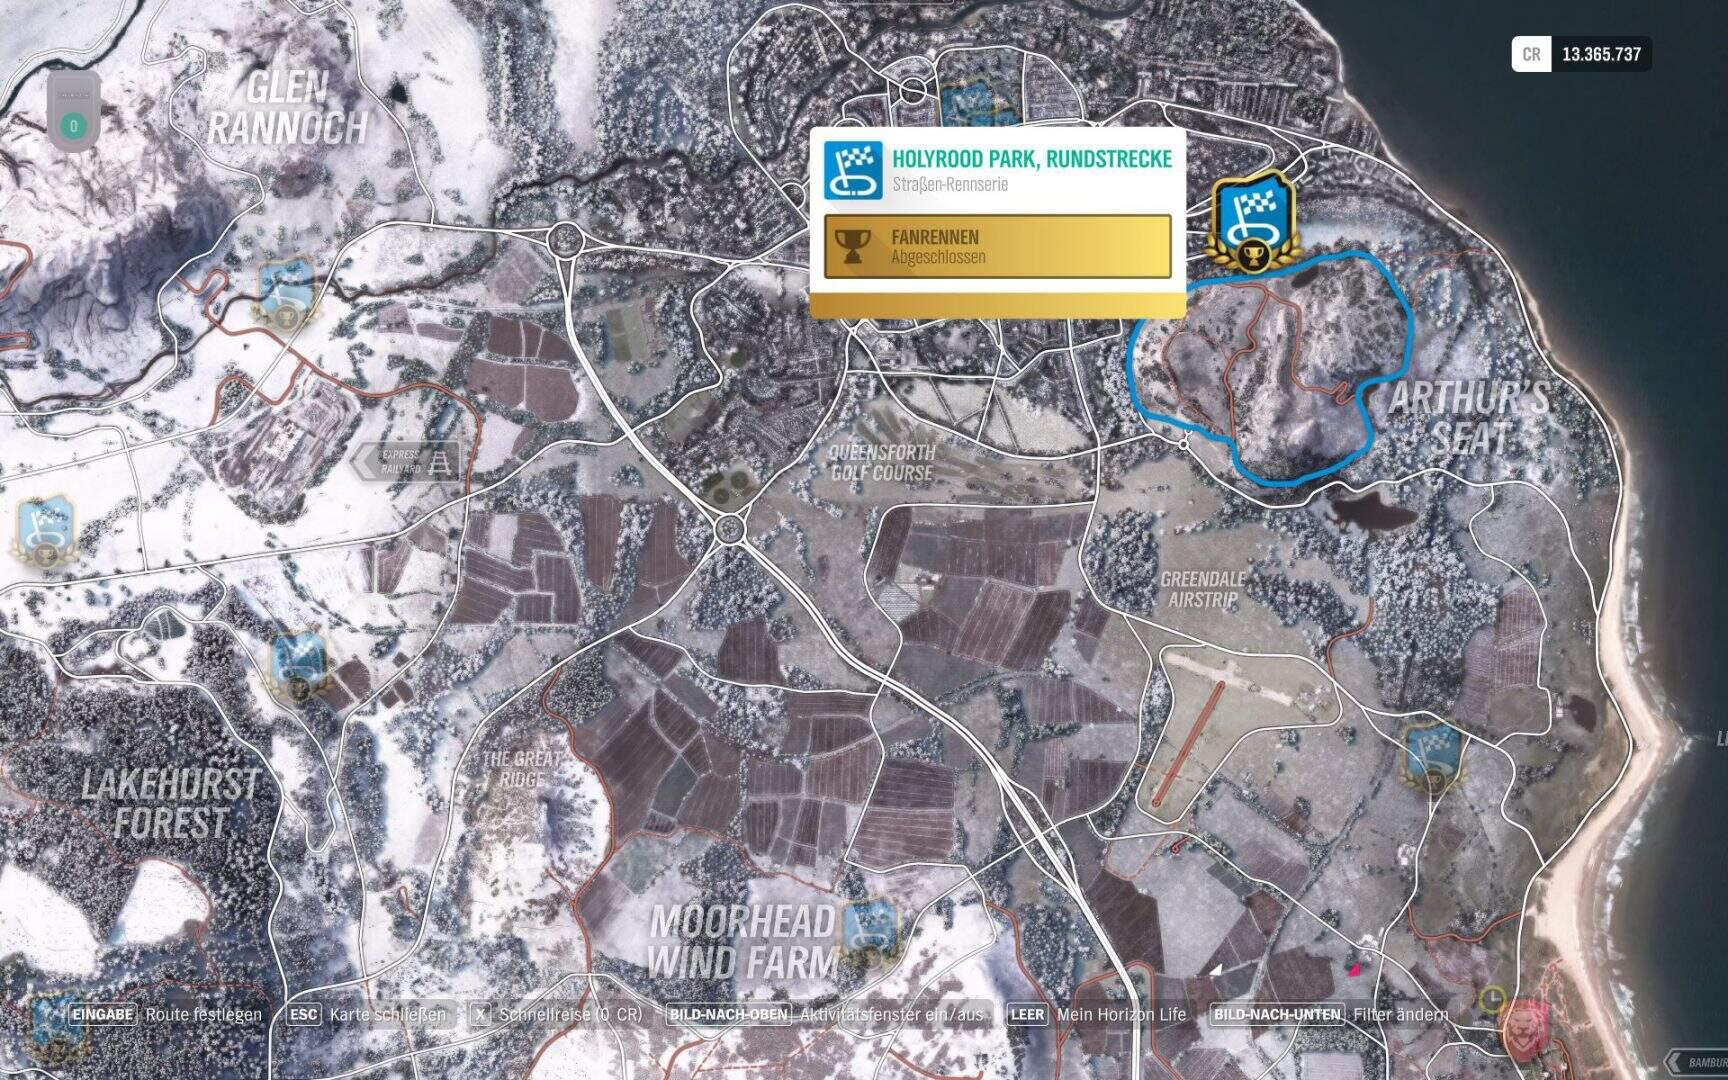 Forza Horizon 4 Holyrookd Park Rundstrecke, Location